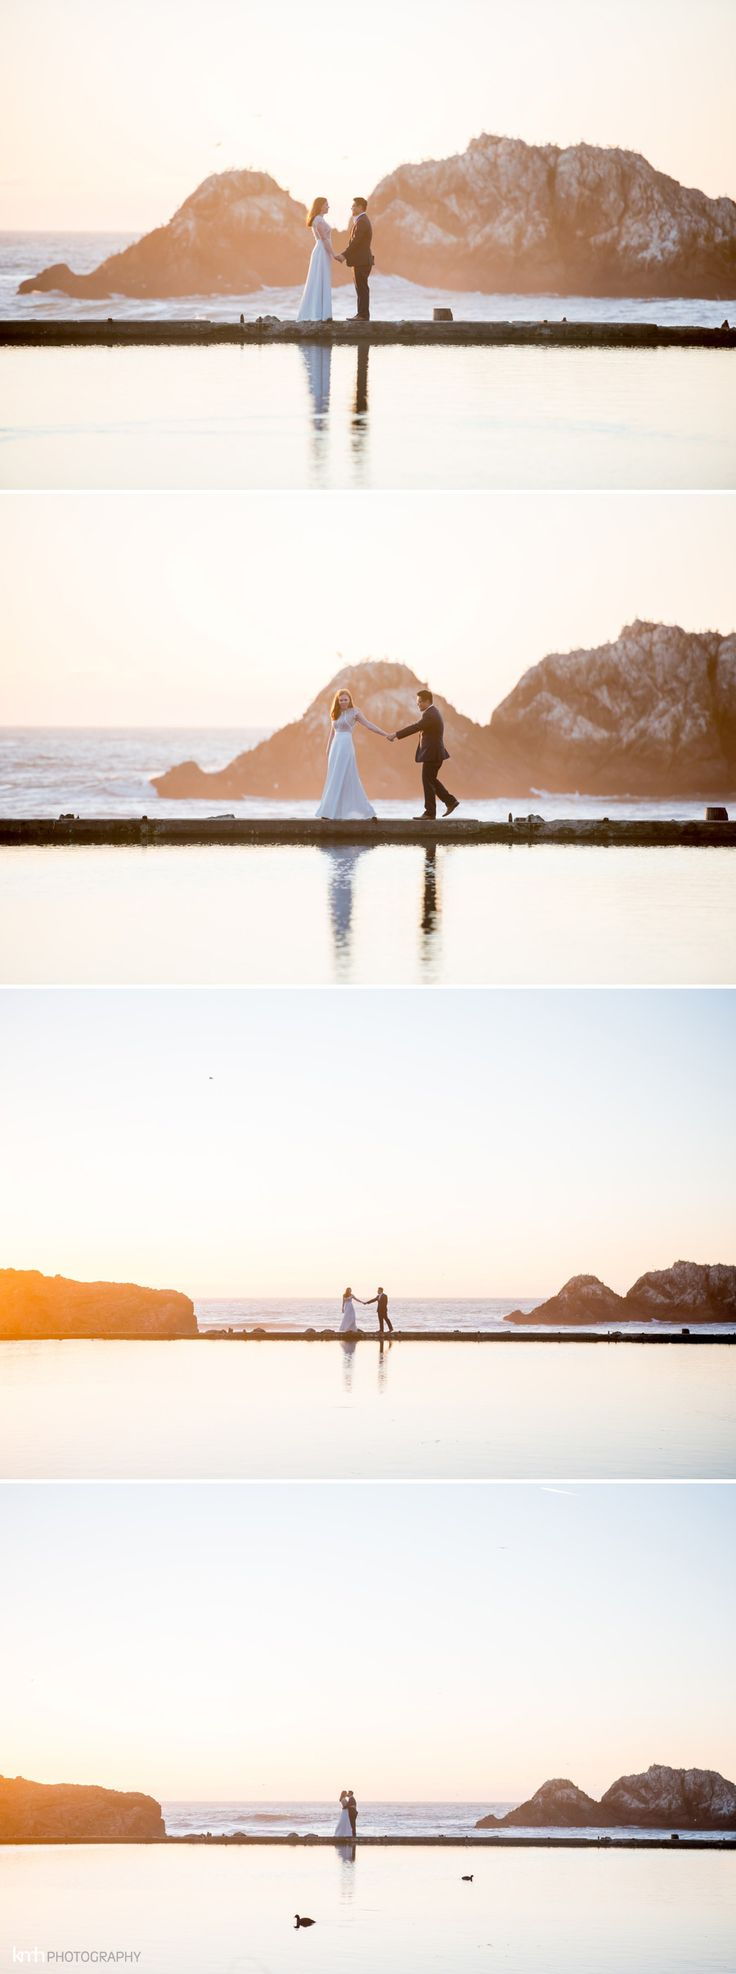 San Francisco Engagement Session at Sutro Baths | KMH Photography, Las Vegas + Destination Wedding Photographer